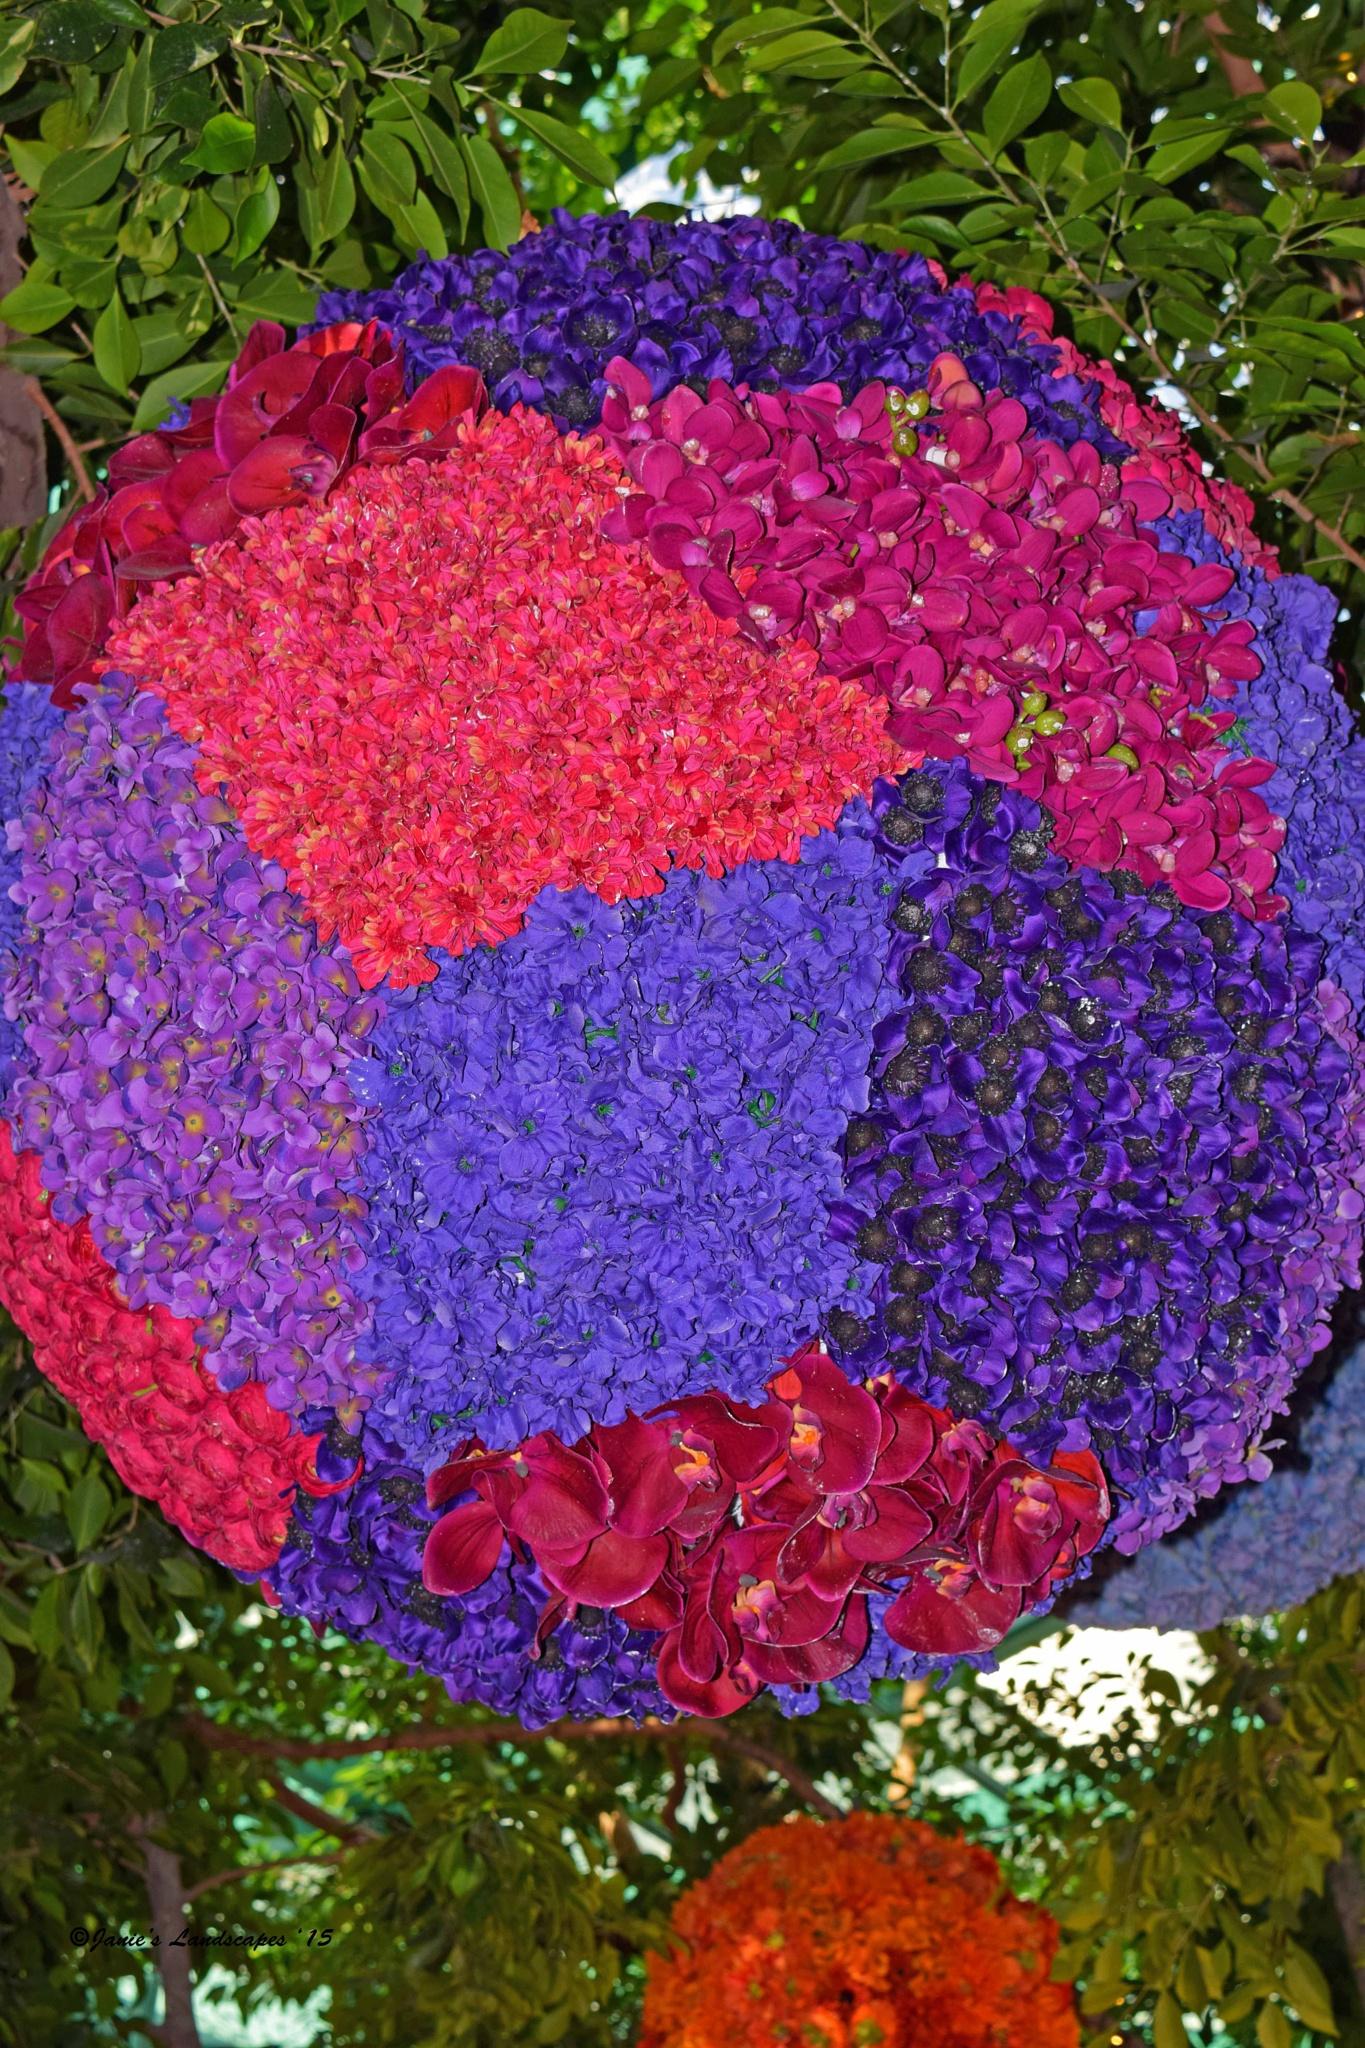 Ball of Flowers at Wynn Las Vegas by JanetSNeil